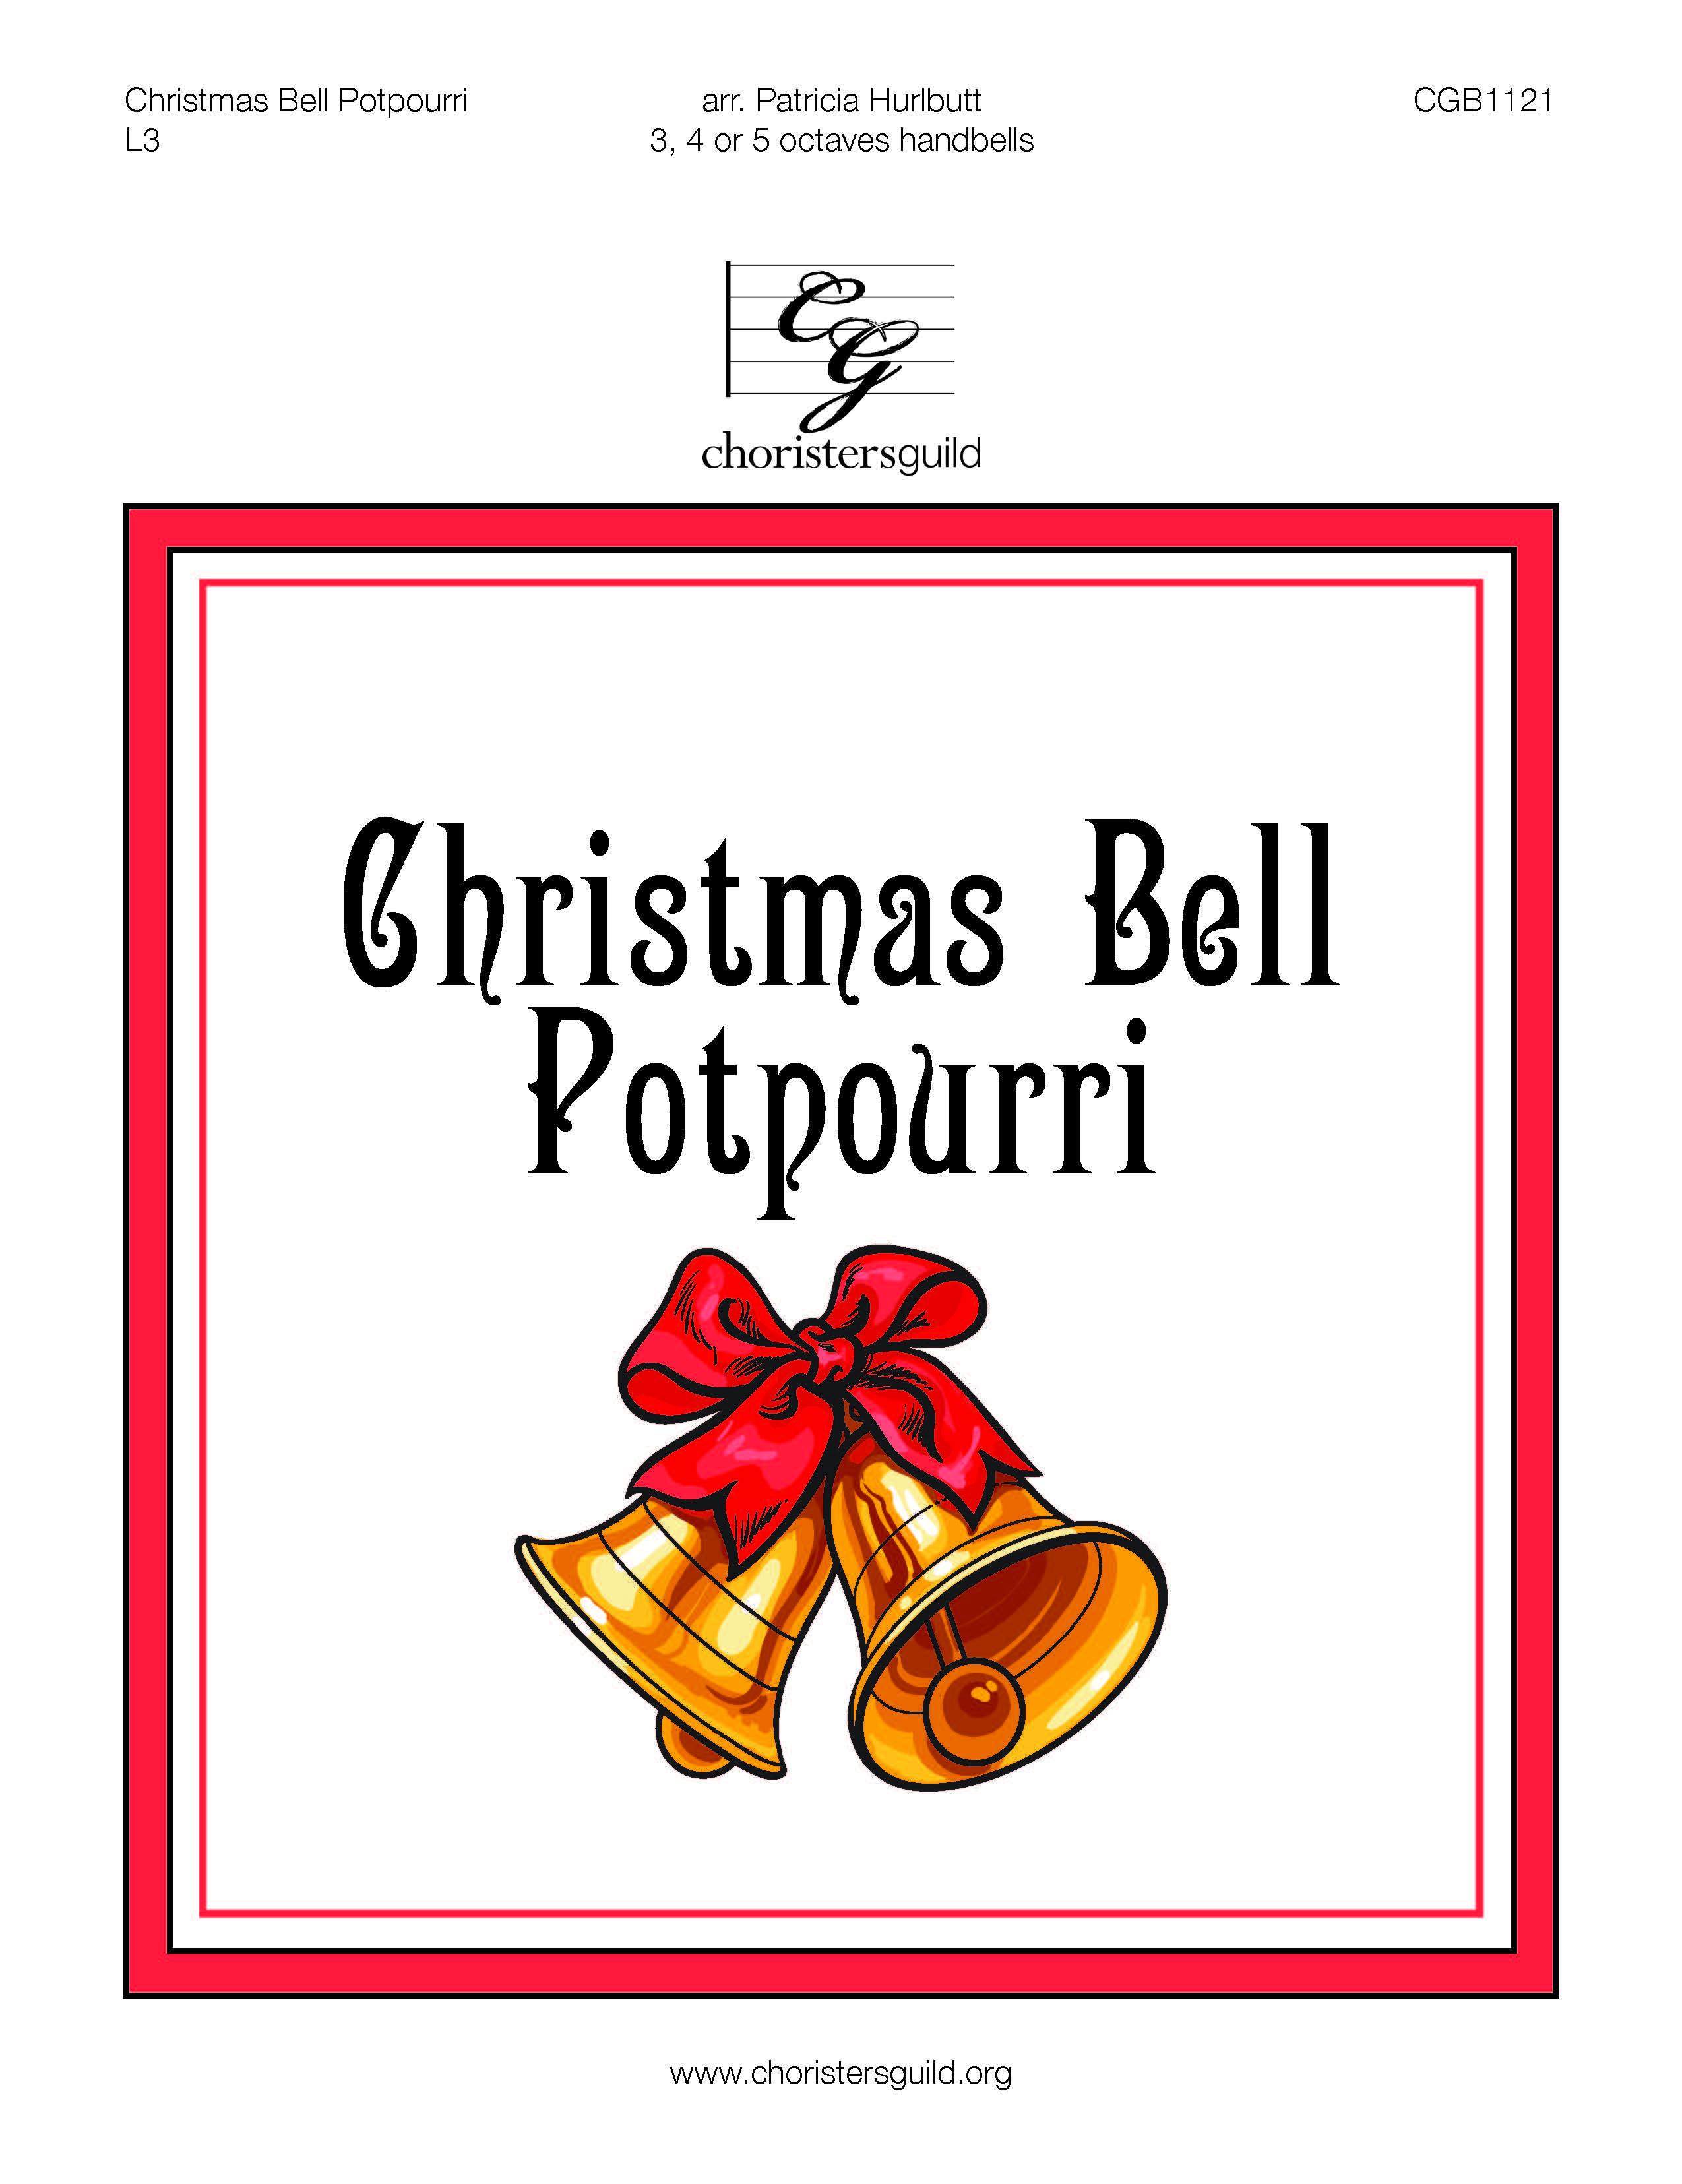 Christmas Bell Potpourri - 3-5 octaves